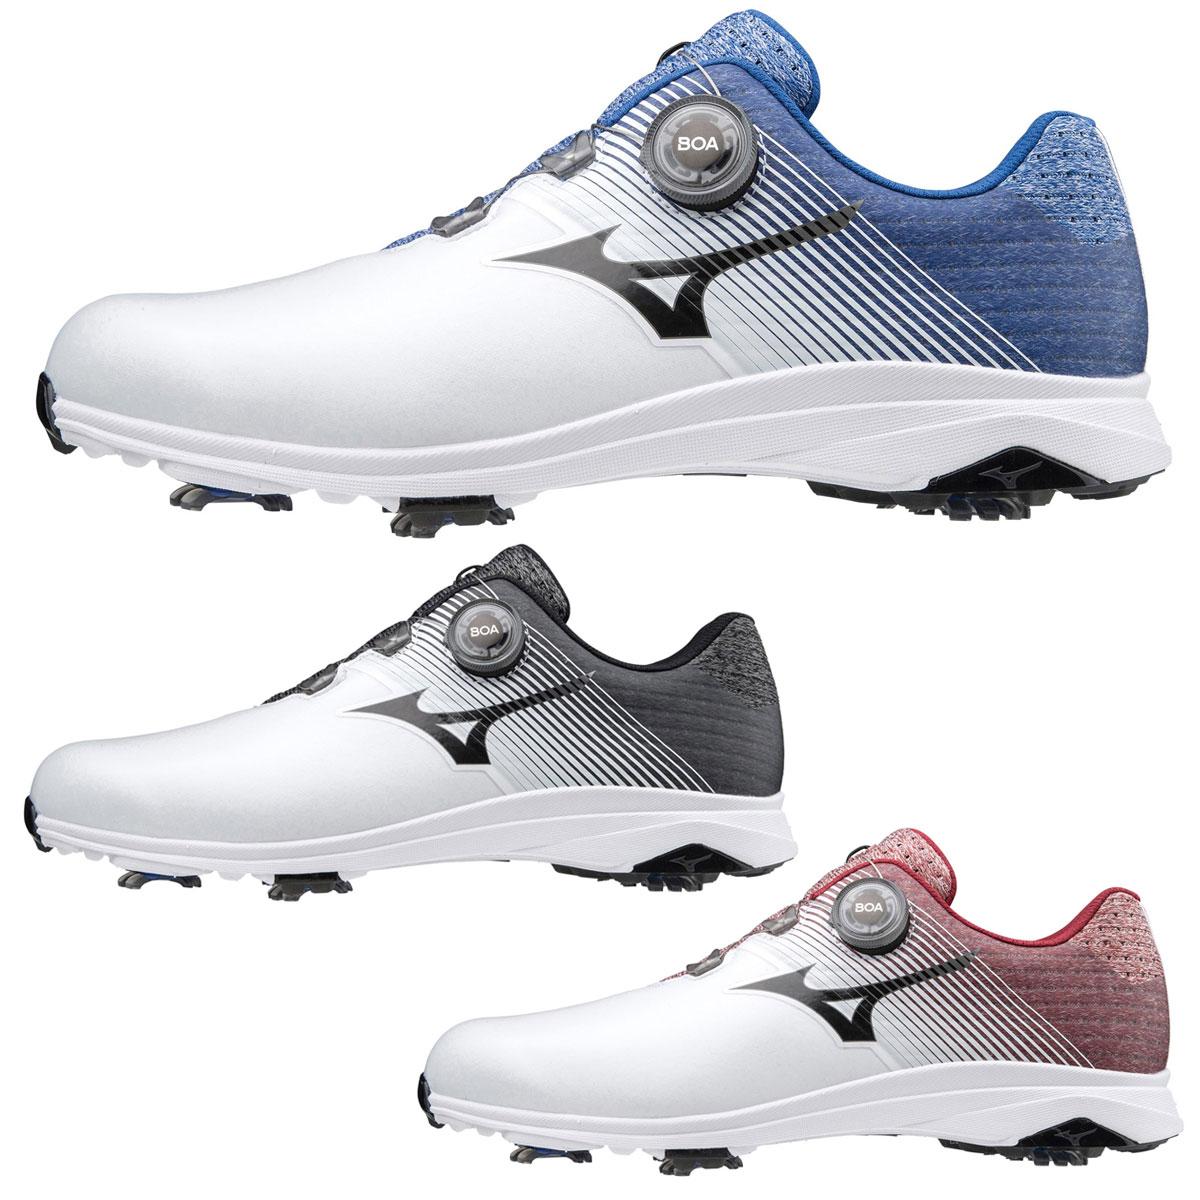 【3E】MIZUNO(ミズノ)ゴルフ日本正規品 NEXLITE007 Boa (ネクスライト007ボア) ソフトスパイクゴルフシューズ 2020新製品 「51GM2010」【あす楽対応】